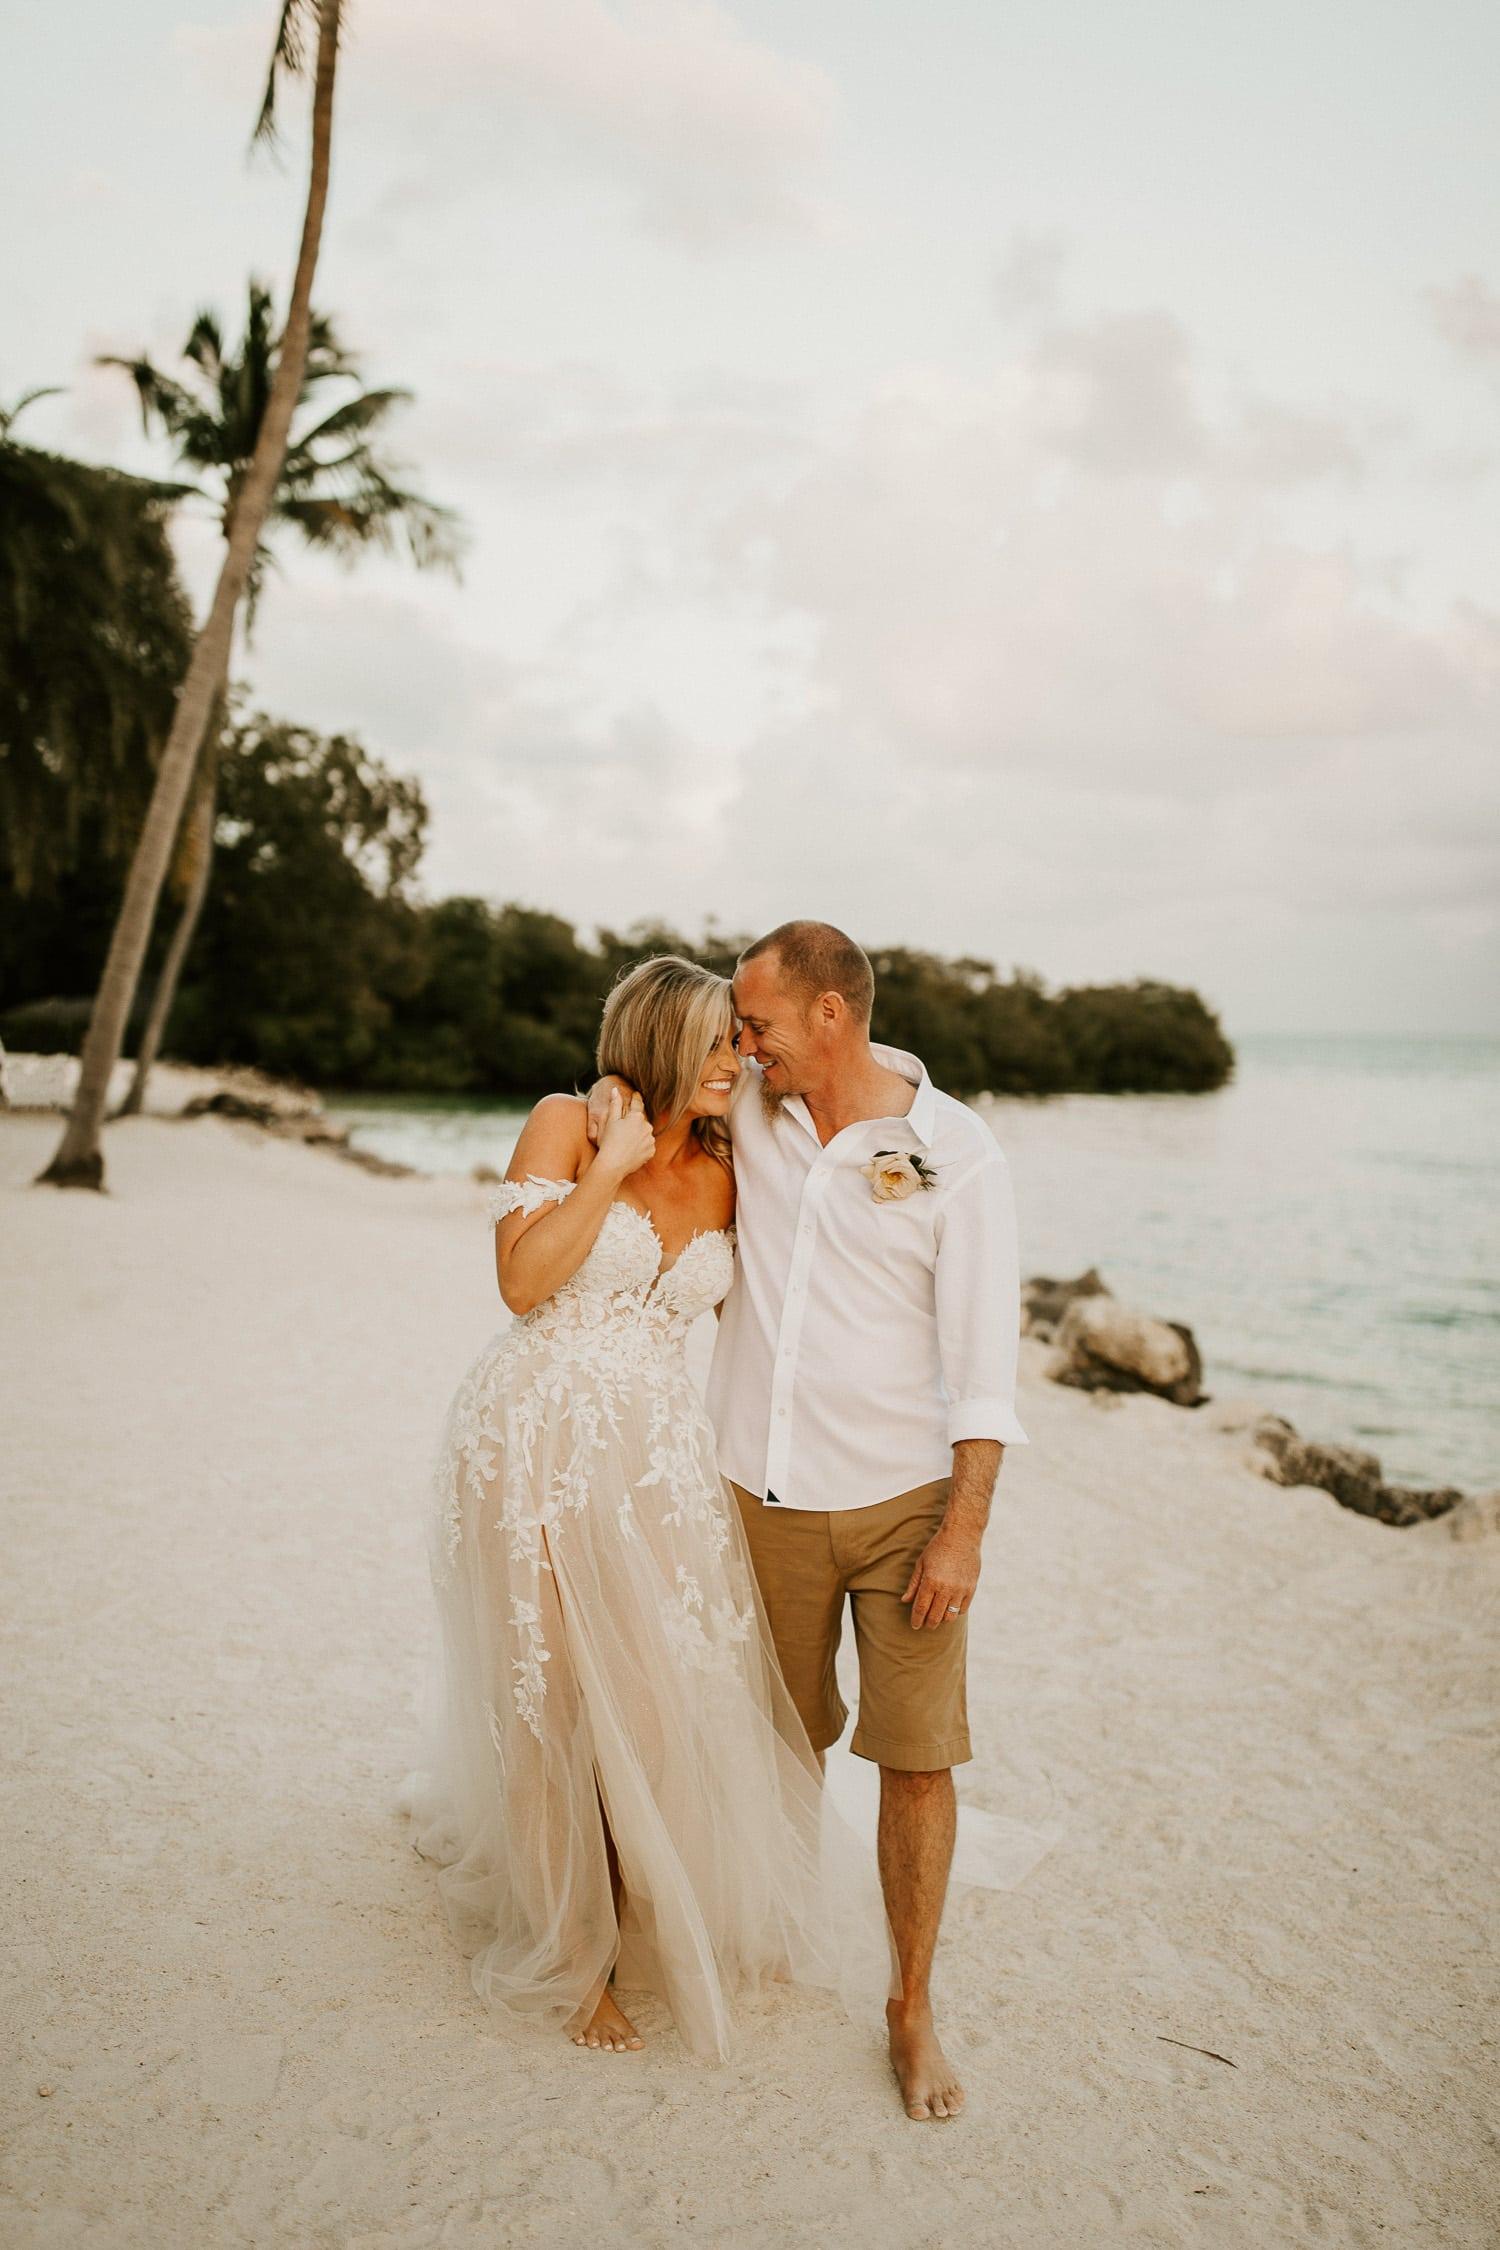 Bride and groom walking together along the beach at Pelican Cove Resort in Islamorada, Florida.